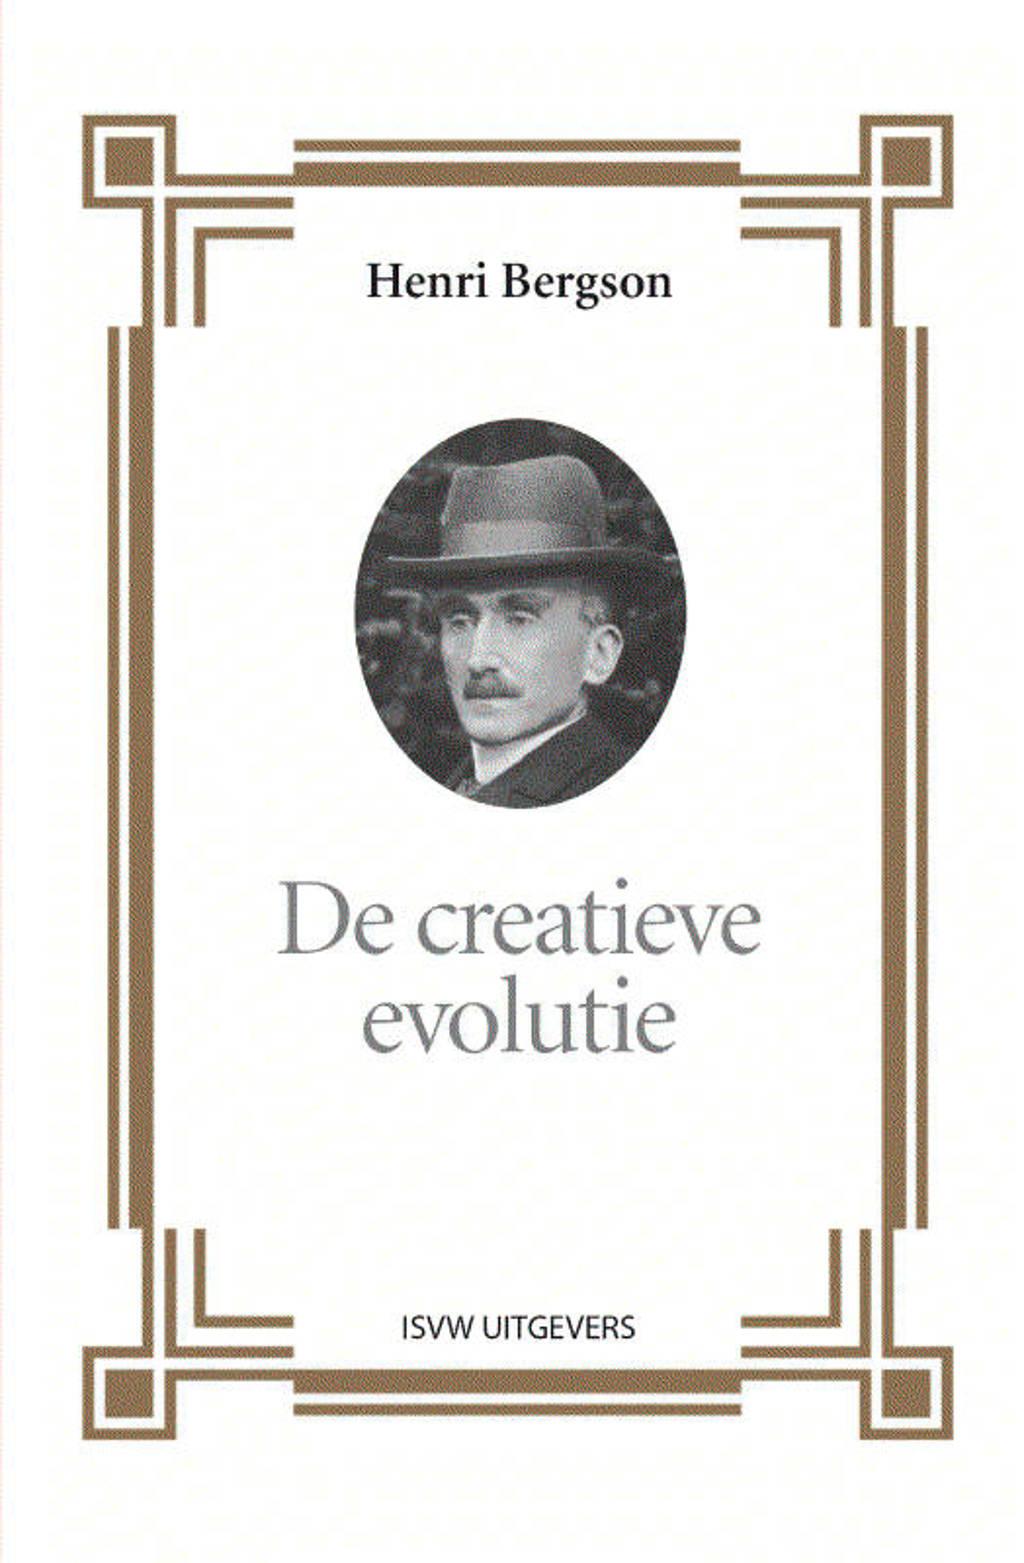 De creatieve evolutie - Henri Bergson